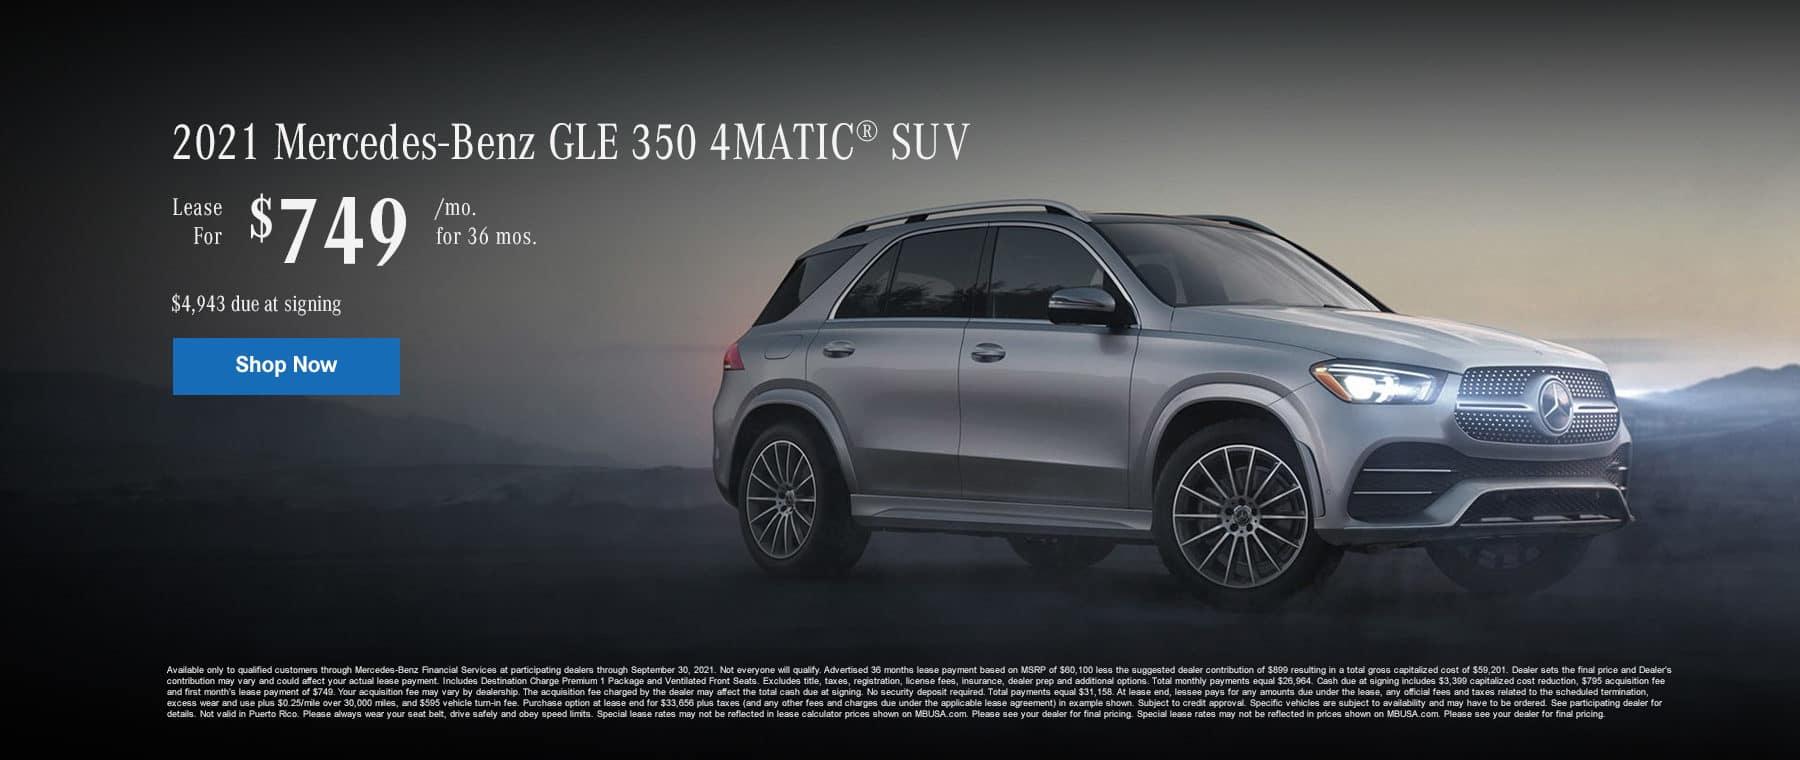 2021 Mercedes-Benz GLE 350 4MATIC® SUV